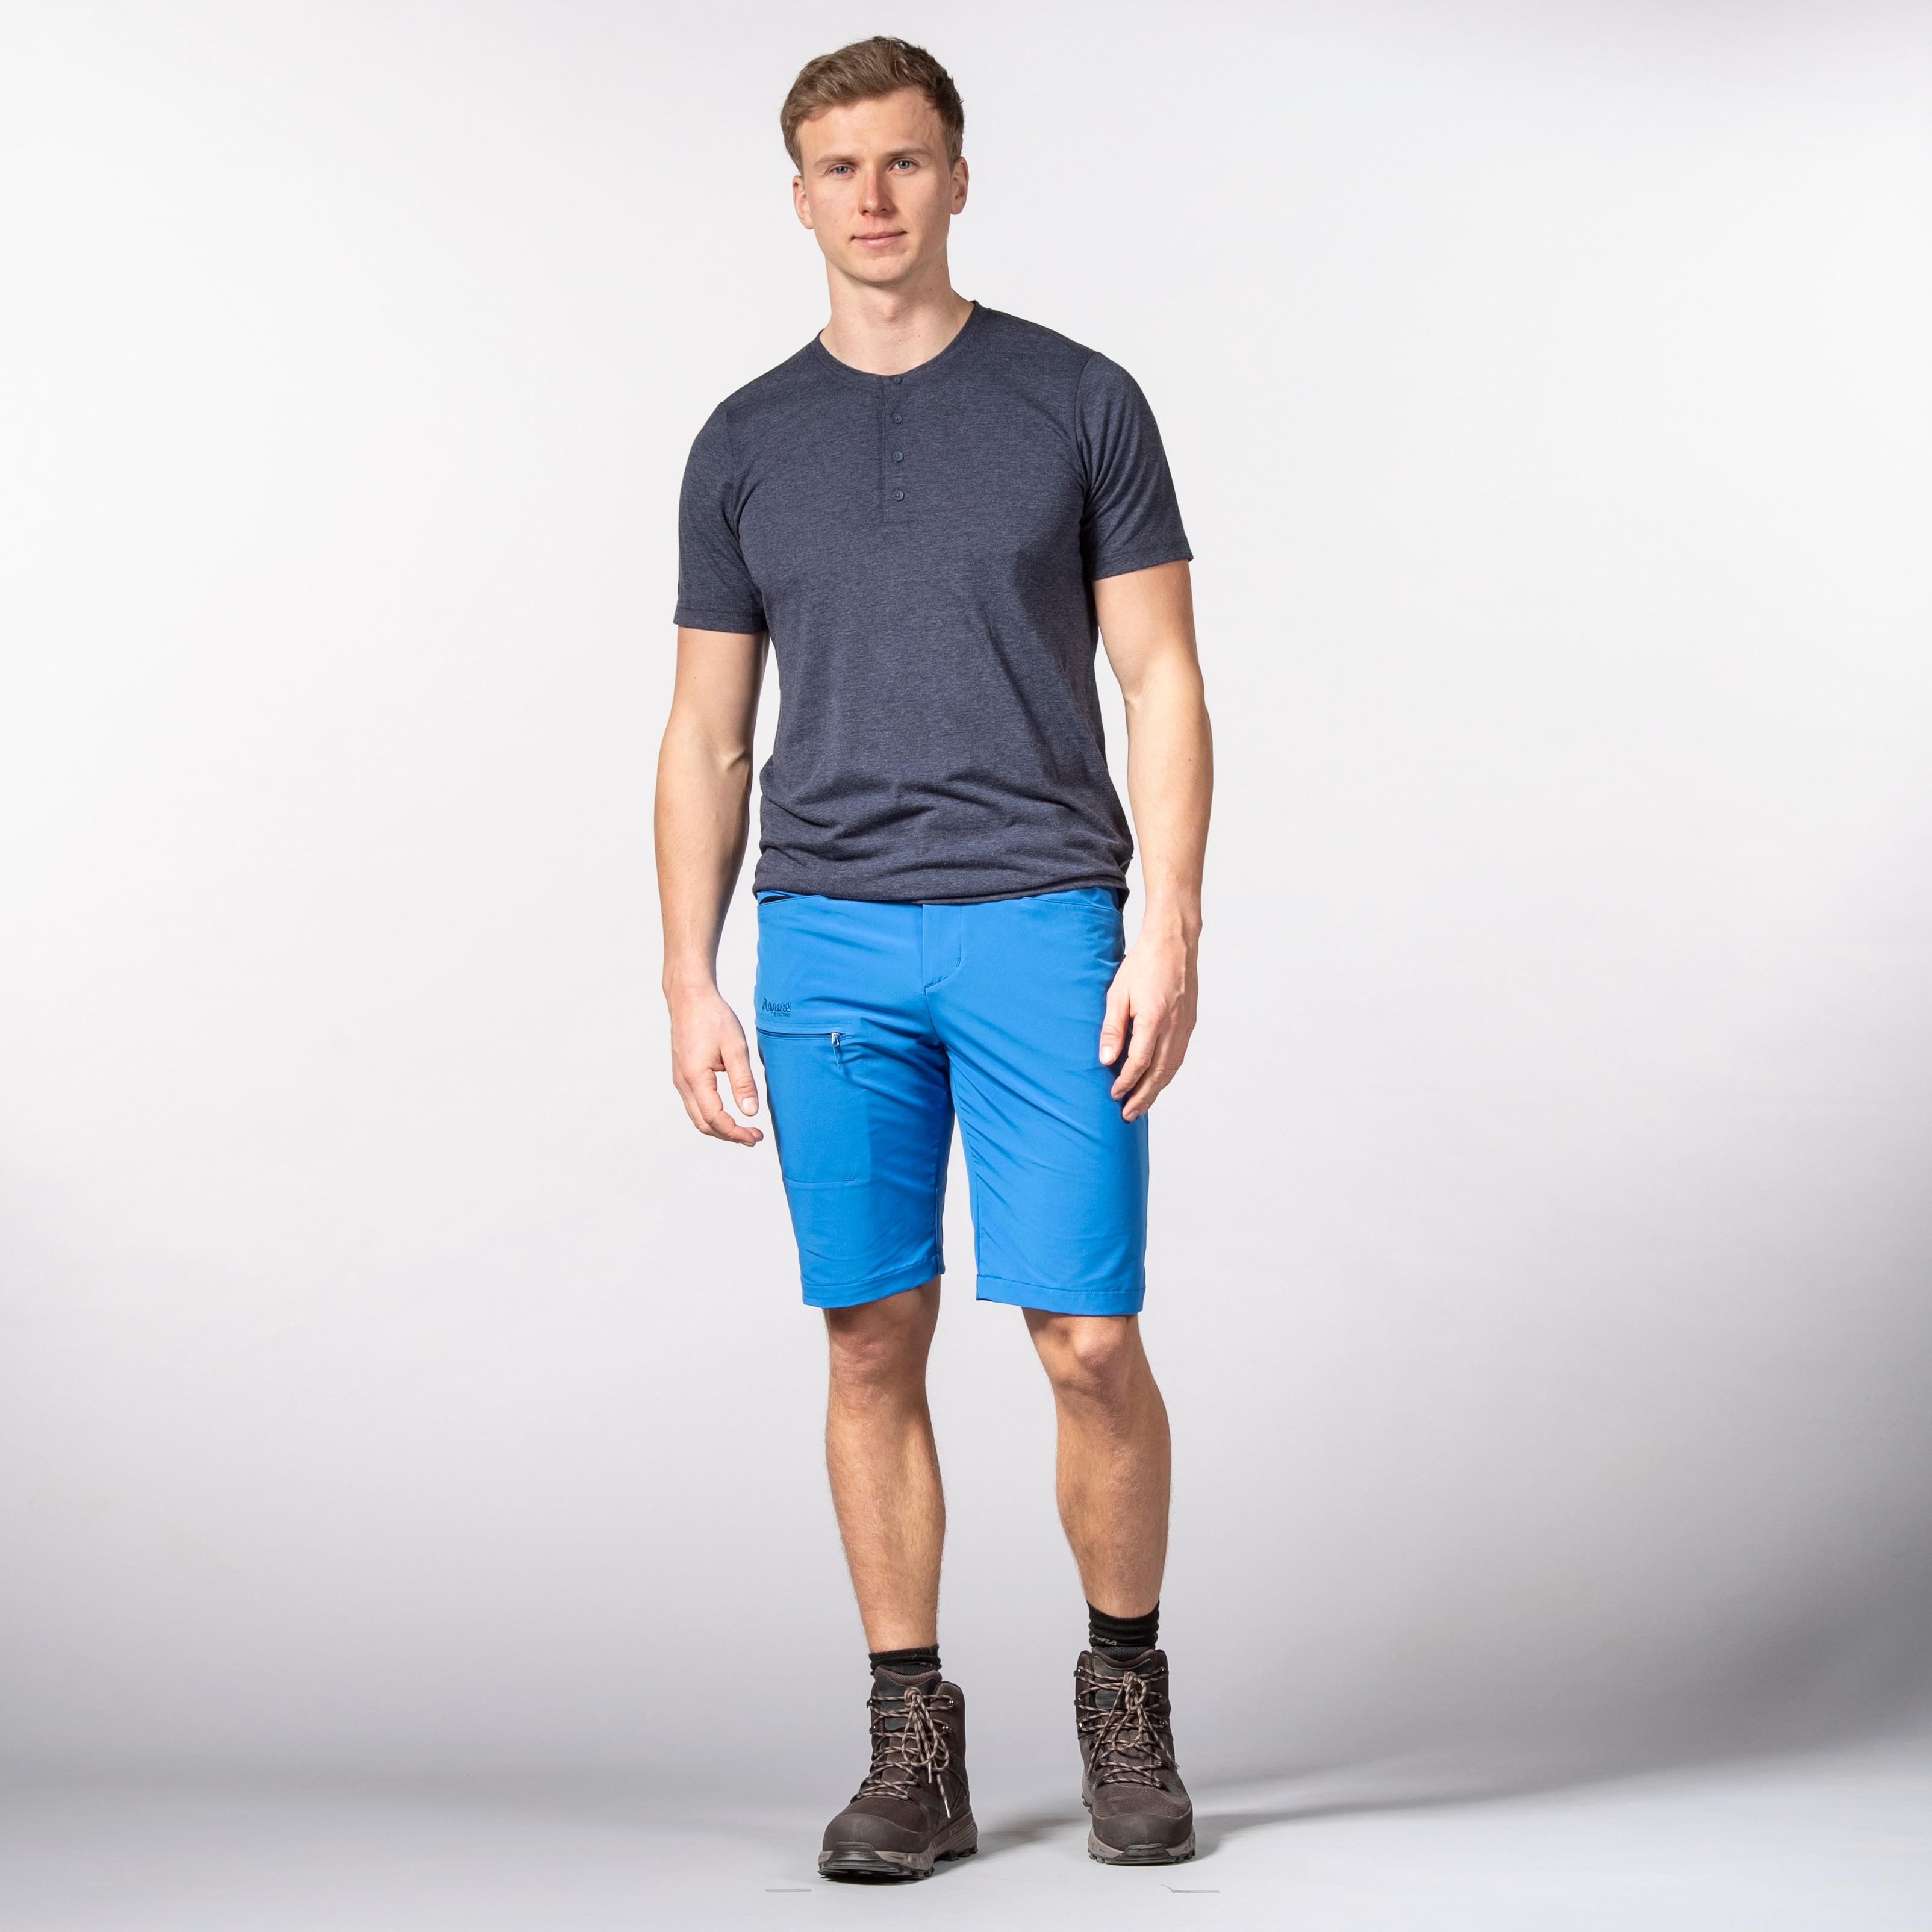 Slingsby LT Softshell Shorts